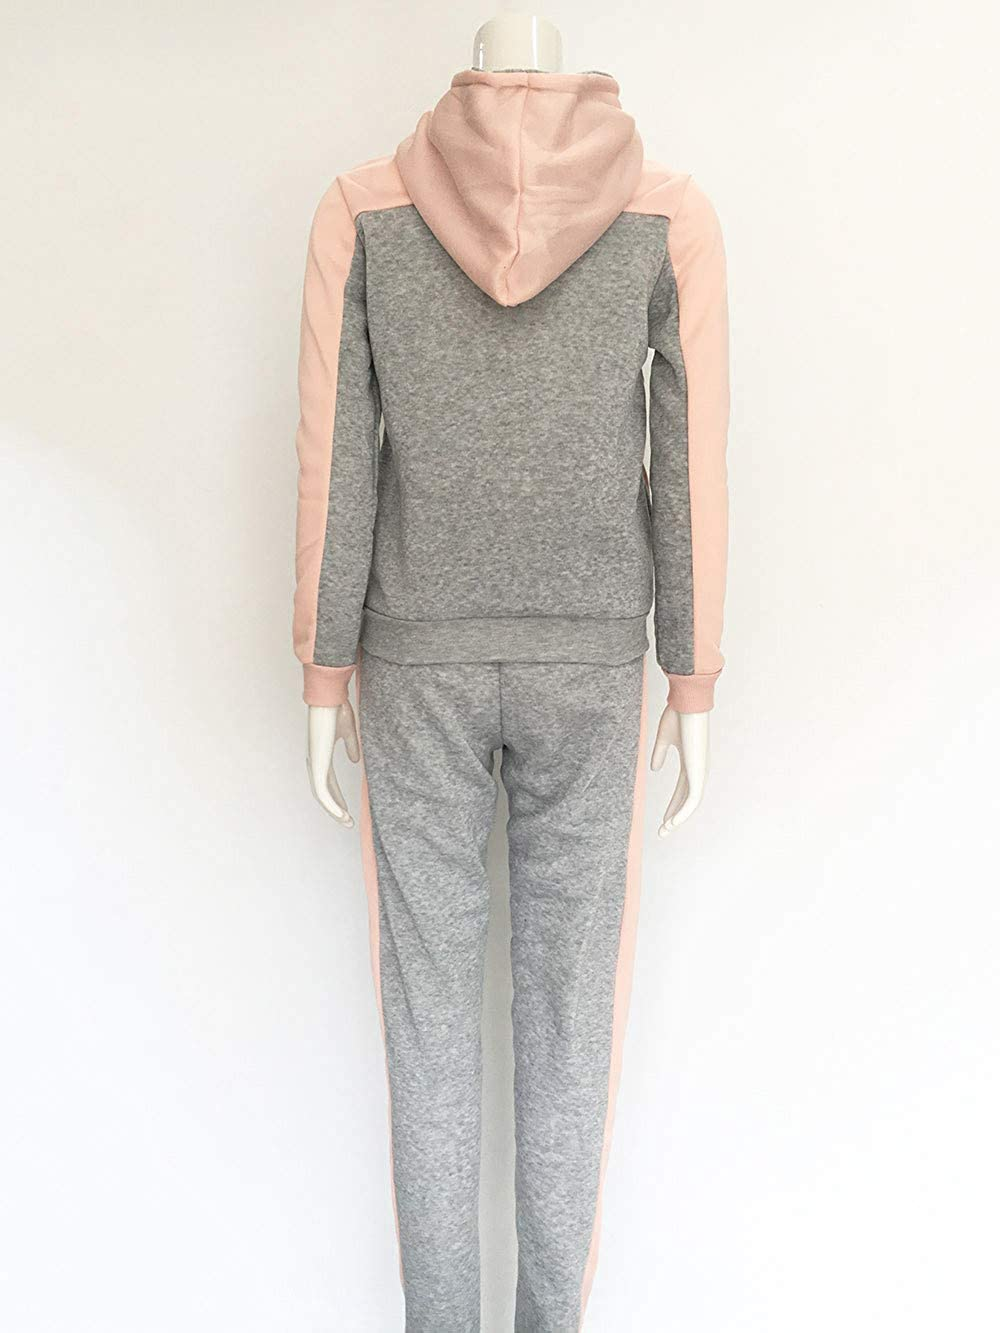 TUDUZ Damen Hausanzug Jogginganzug Jumpsuit Langarm Pullover Sportanzug Trainingsanzug Rundhals Sweatshirt Lang X-rosa